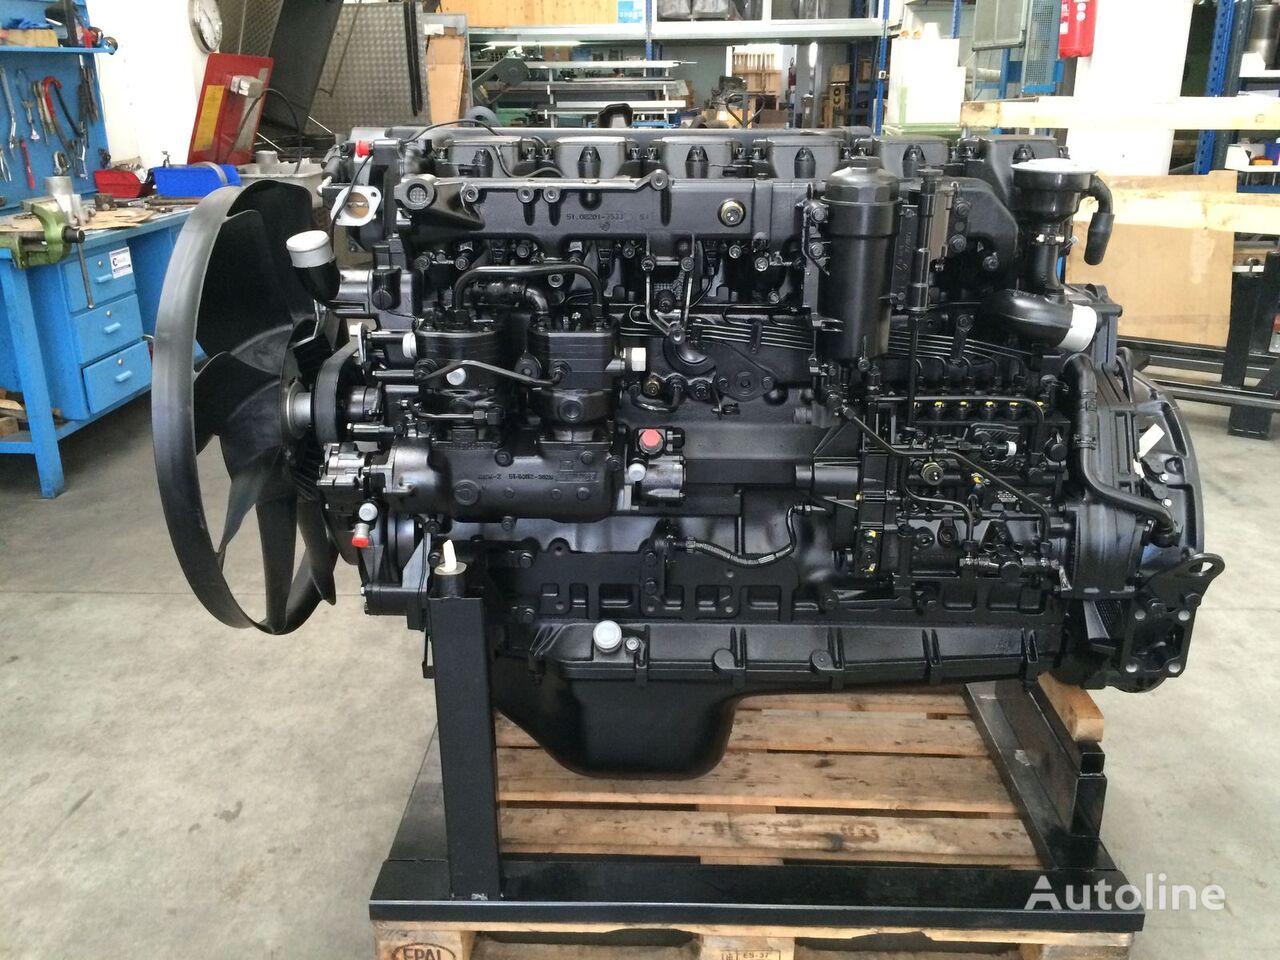 MAN D2876LF03 - D2876LF04 (D2876 TRUCK) motor para MAN camión